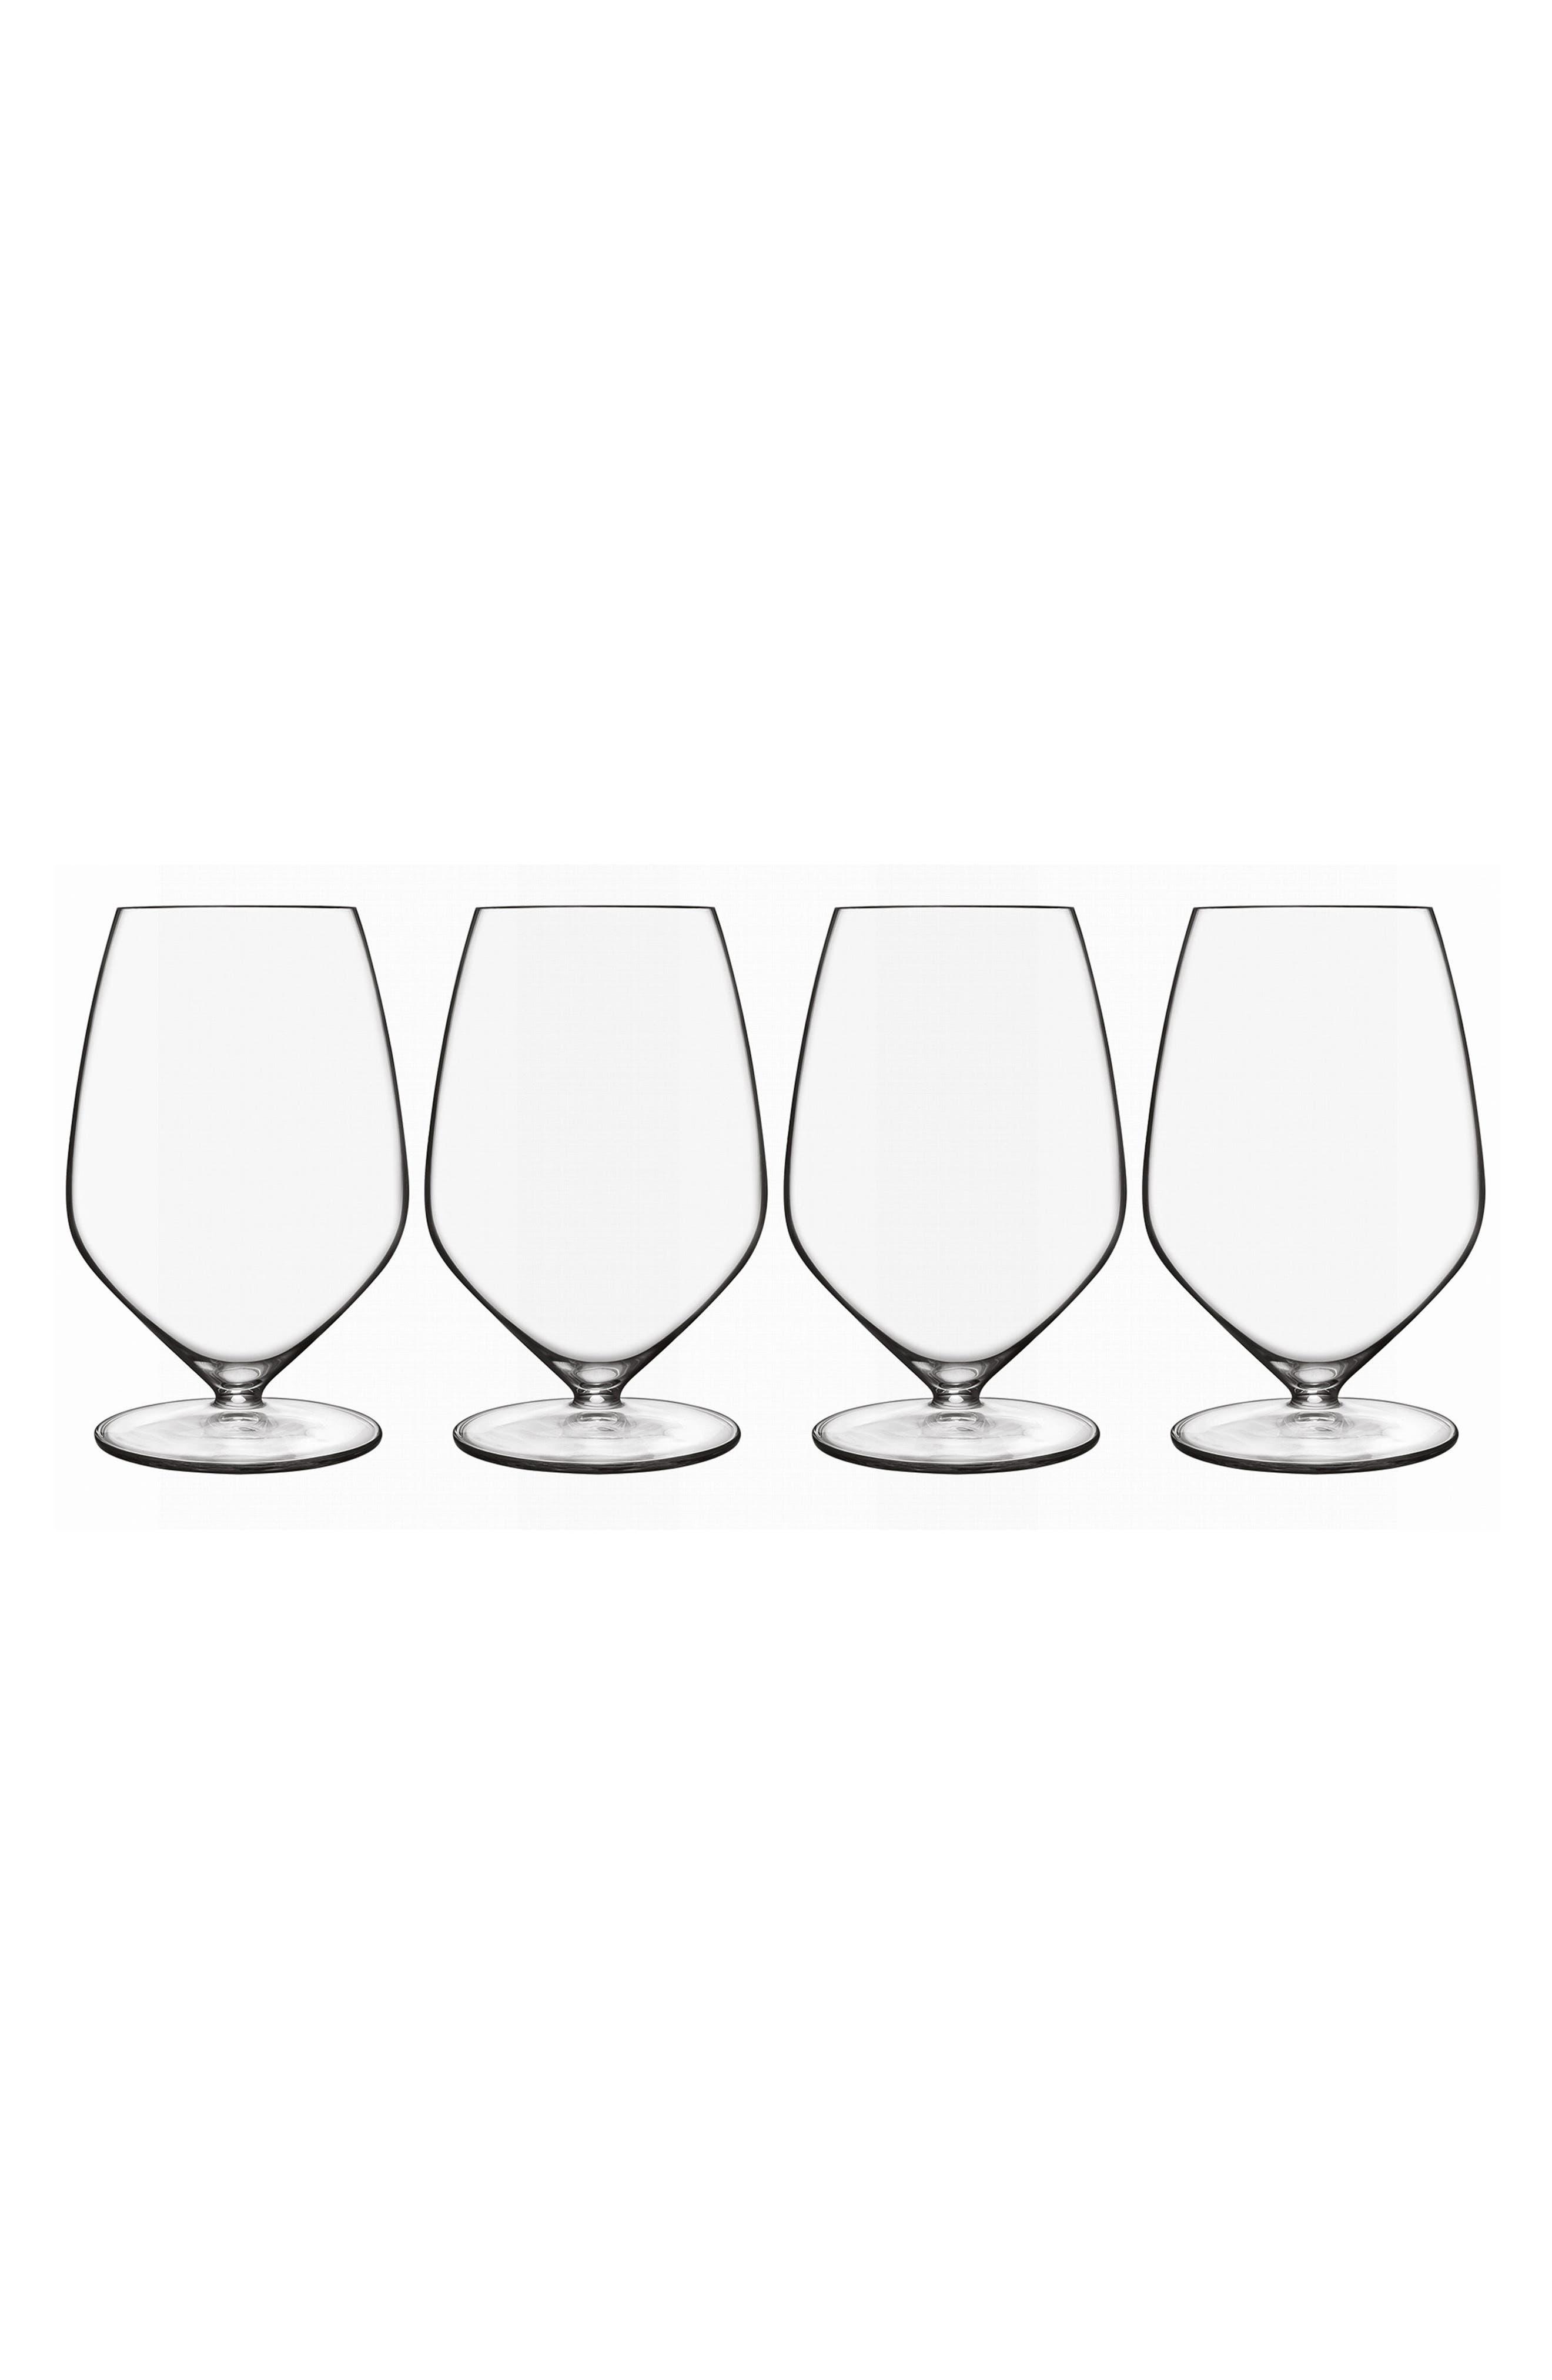 Main Image - Luigi Bormioli T-Glass Set of 4 Cabernet/Merlot Glasses